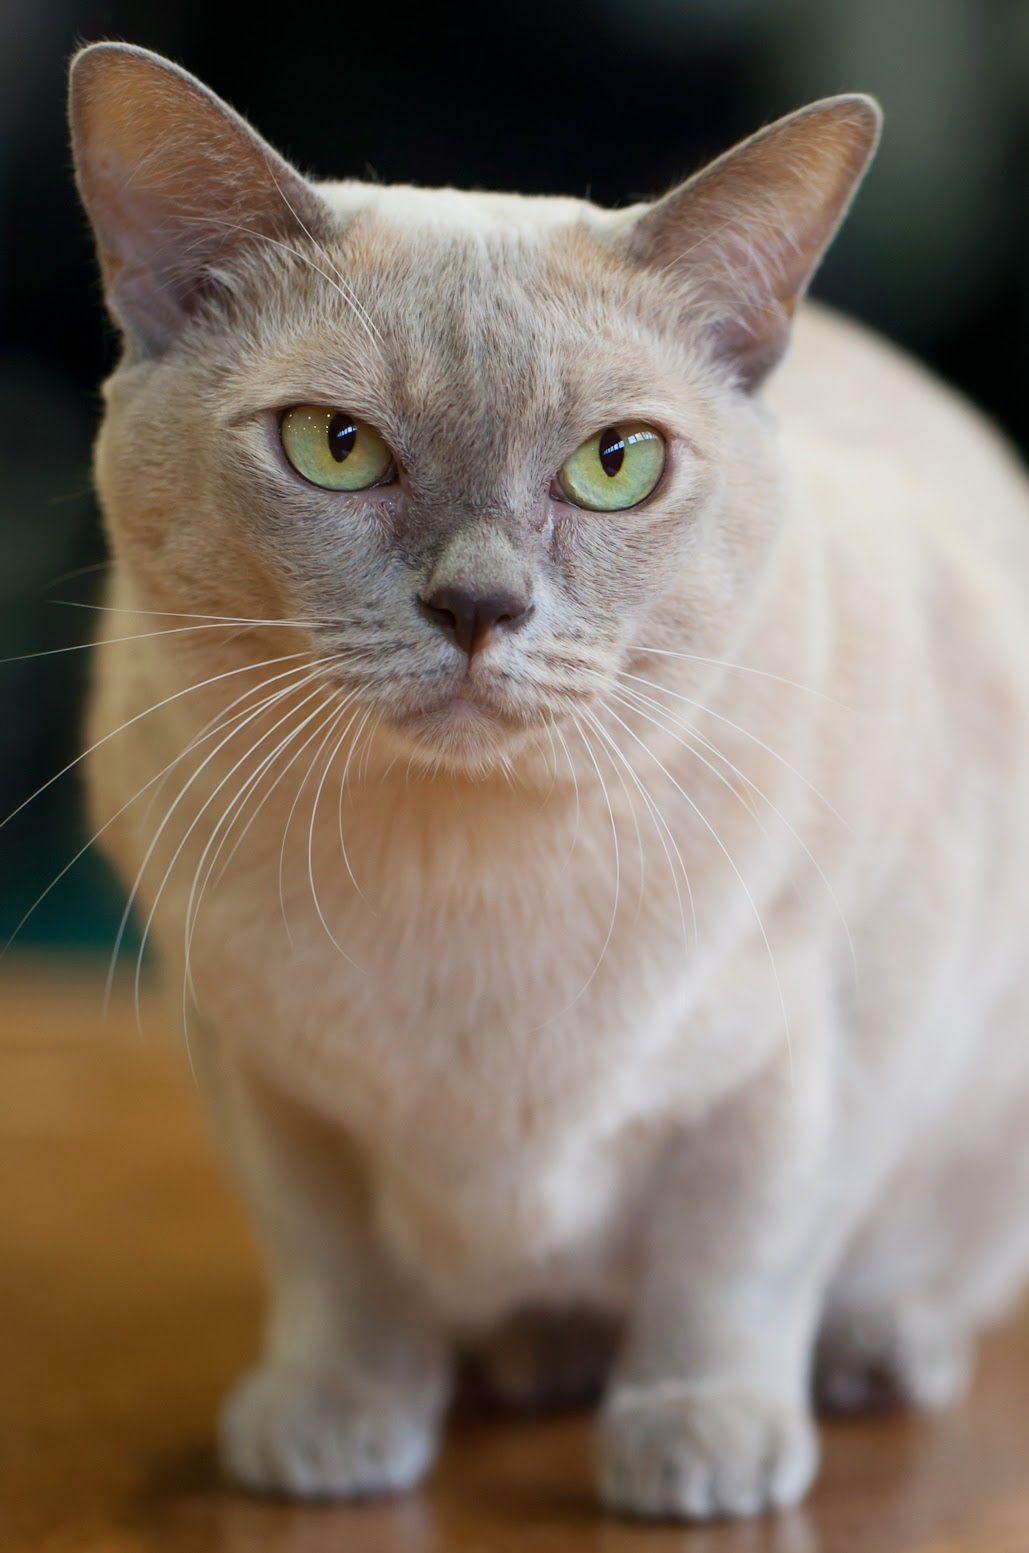 Size And Weight Of Burmese Cats Annie Many Cat Breeds Burmese Cat Burmese Kittens